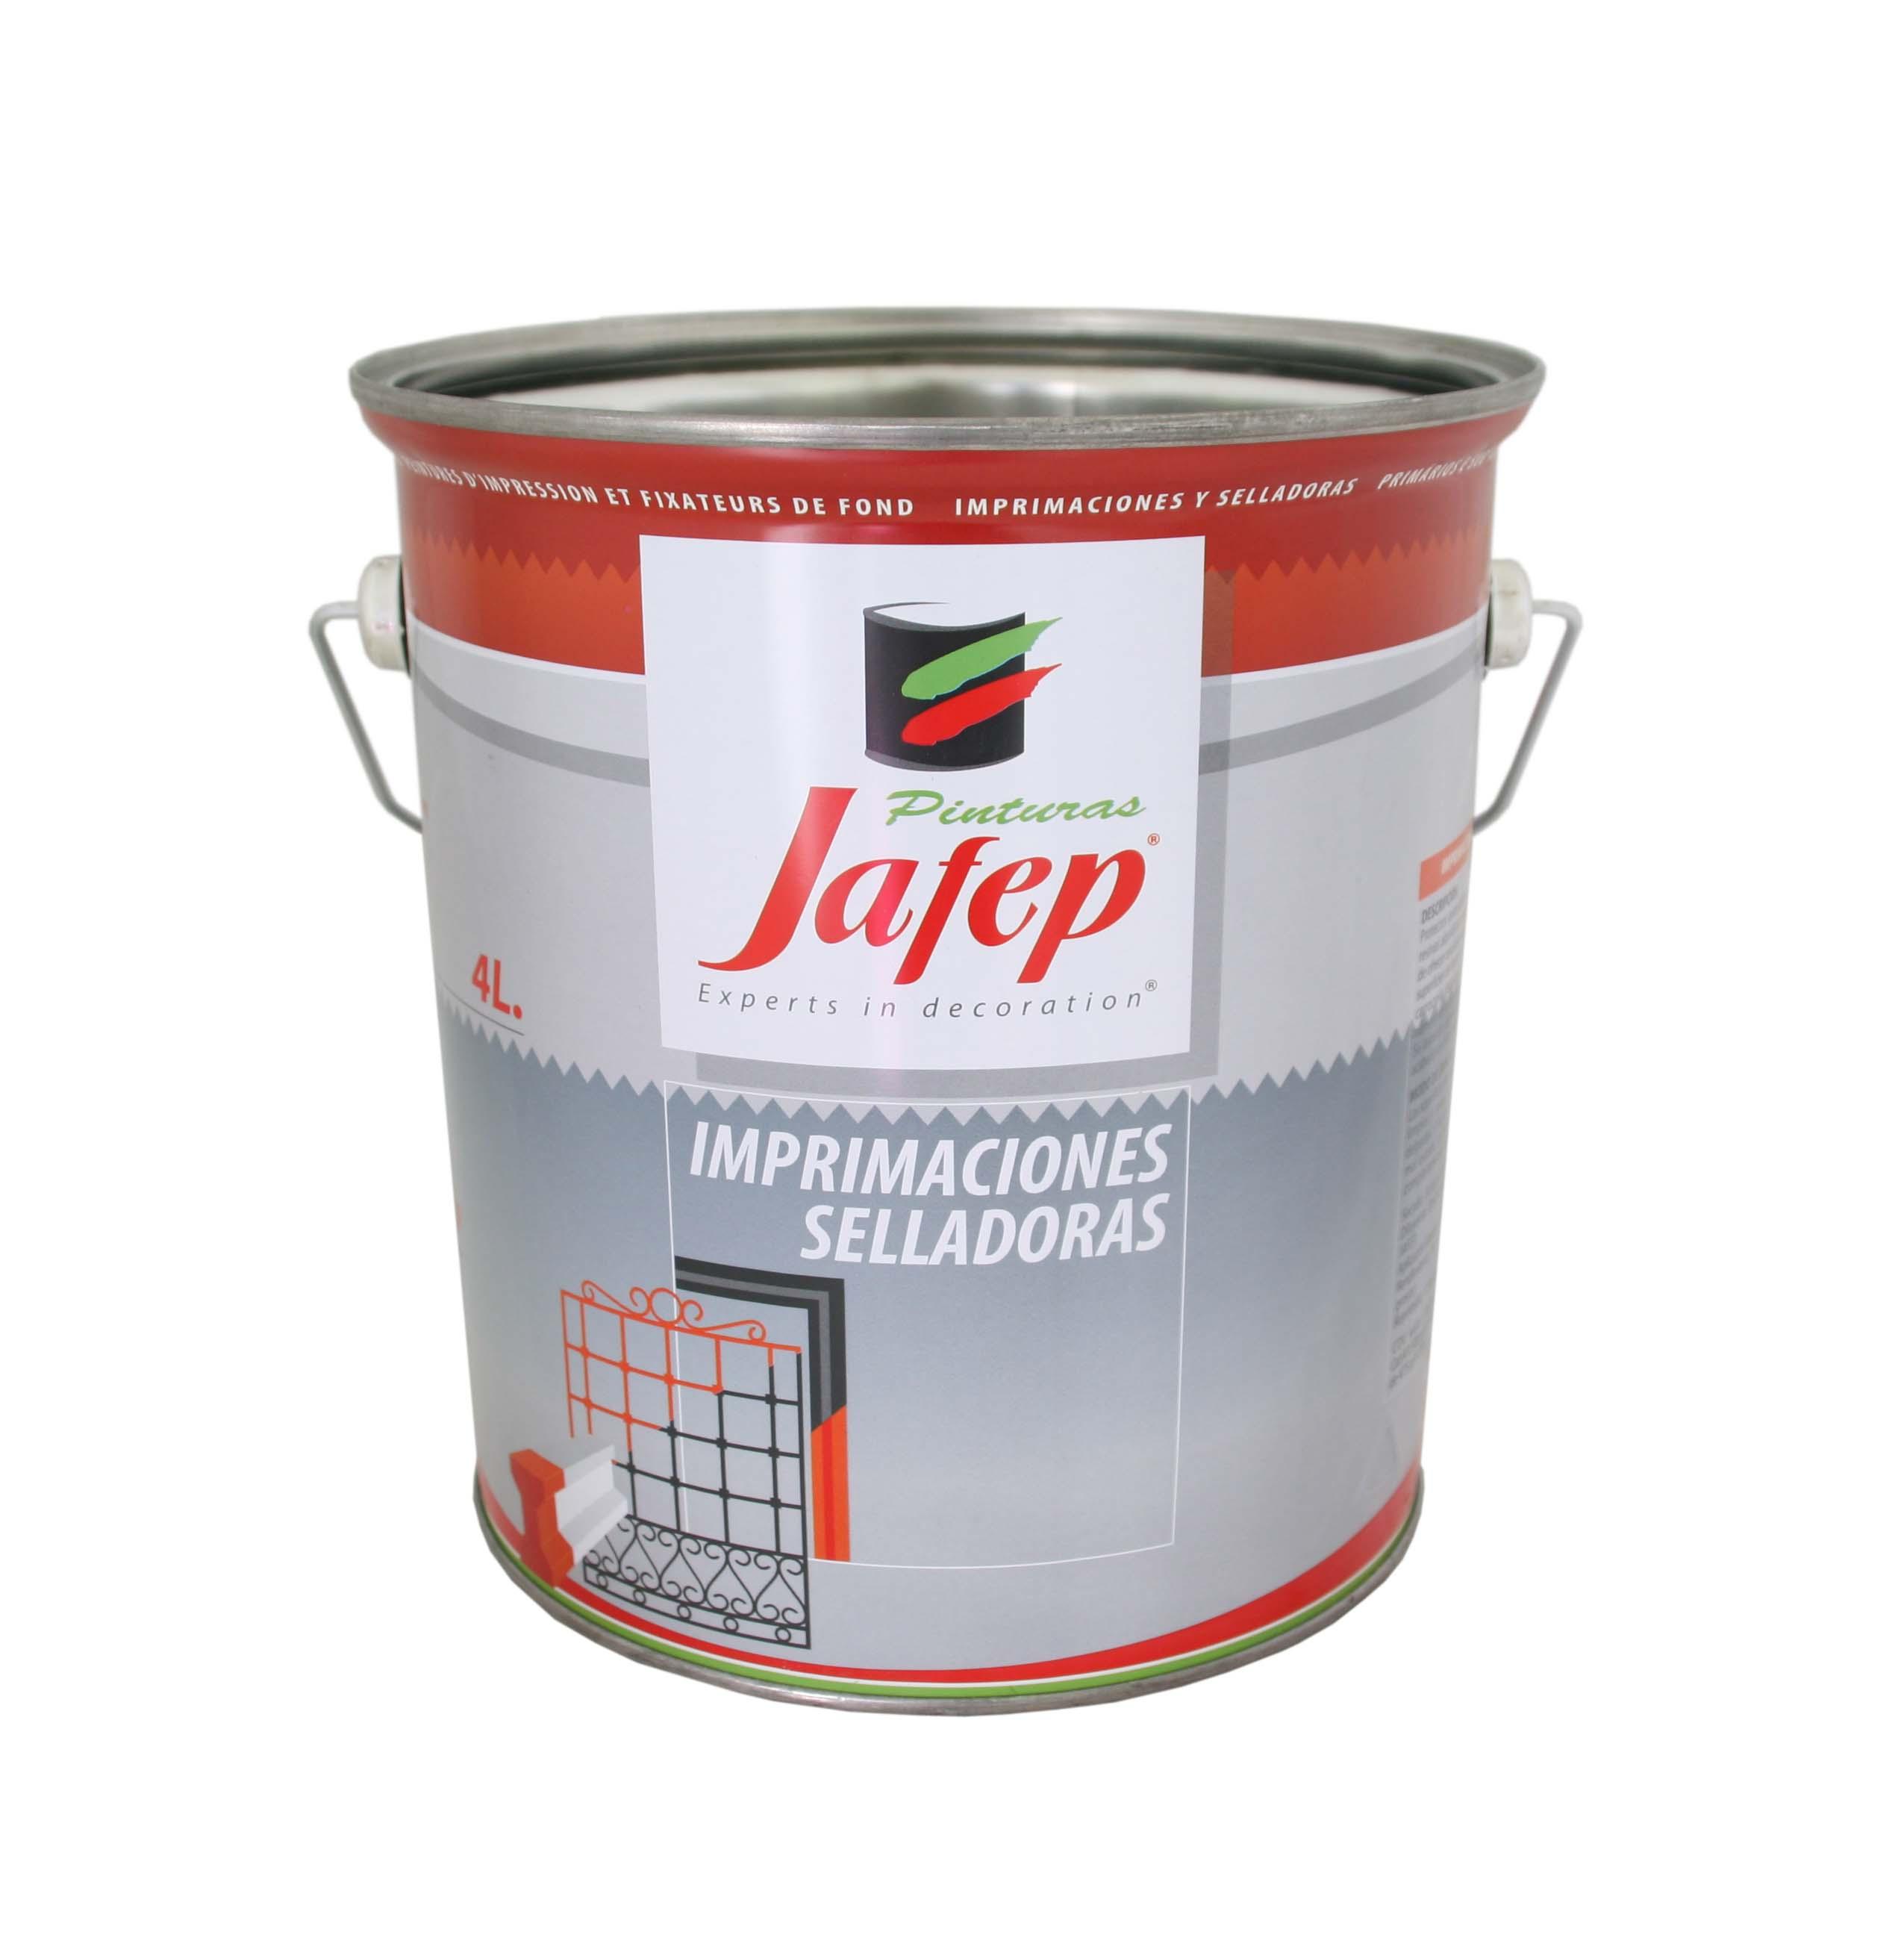 Imprimaci n antioxidante pinturas jafep - Pintura satinada blanca ...